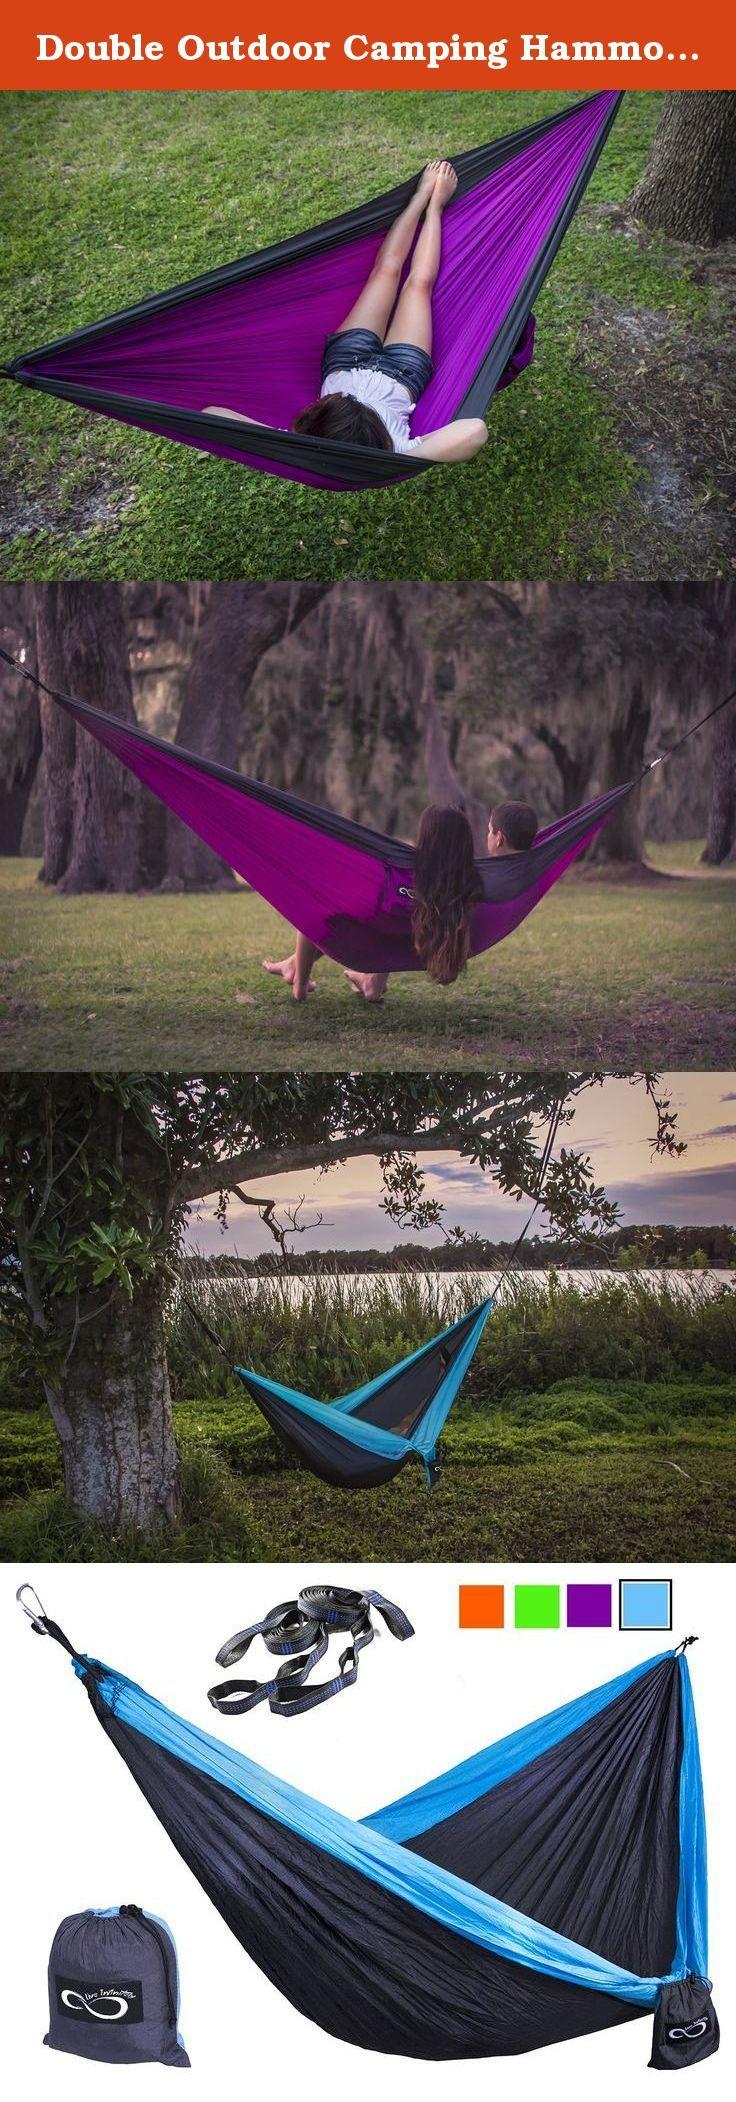 Double outdoor camping hammocks weather resistant lightweight